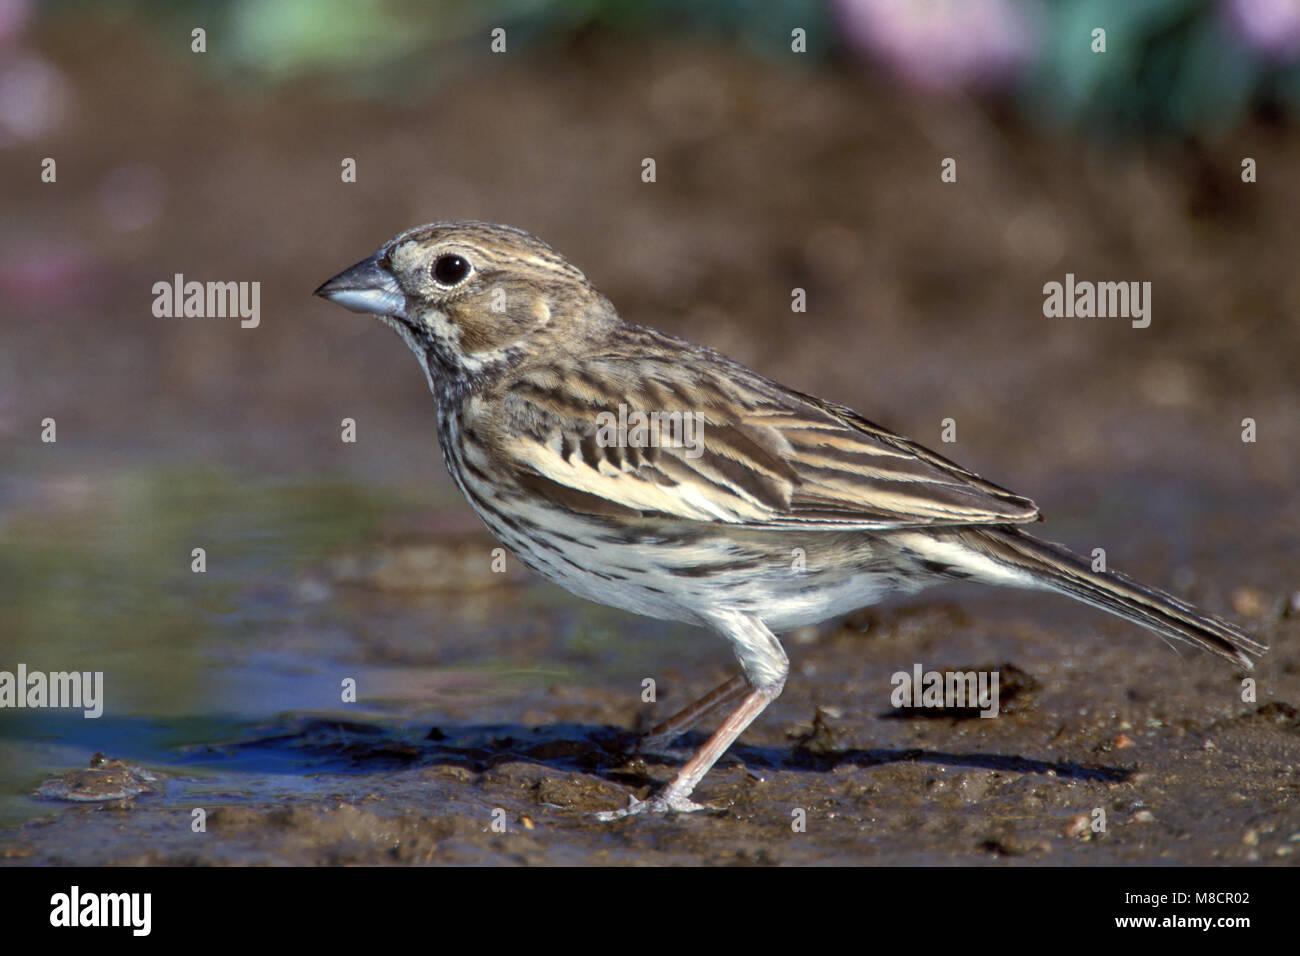 Adult female breeding Weld Co., CO June 2000 - Stock Image